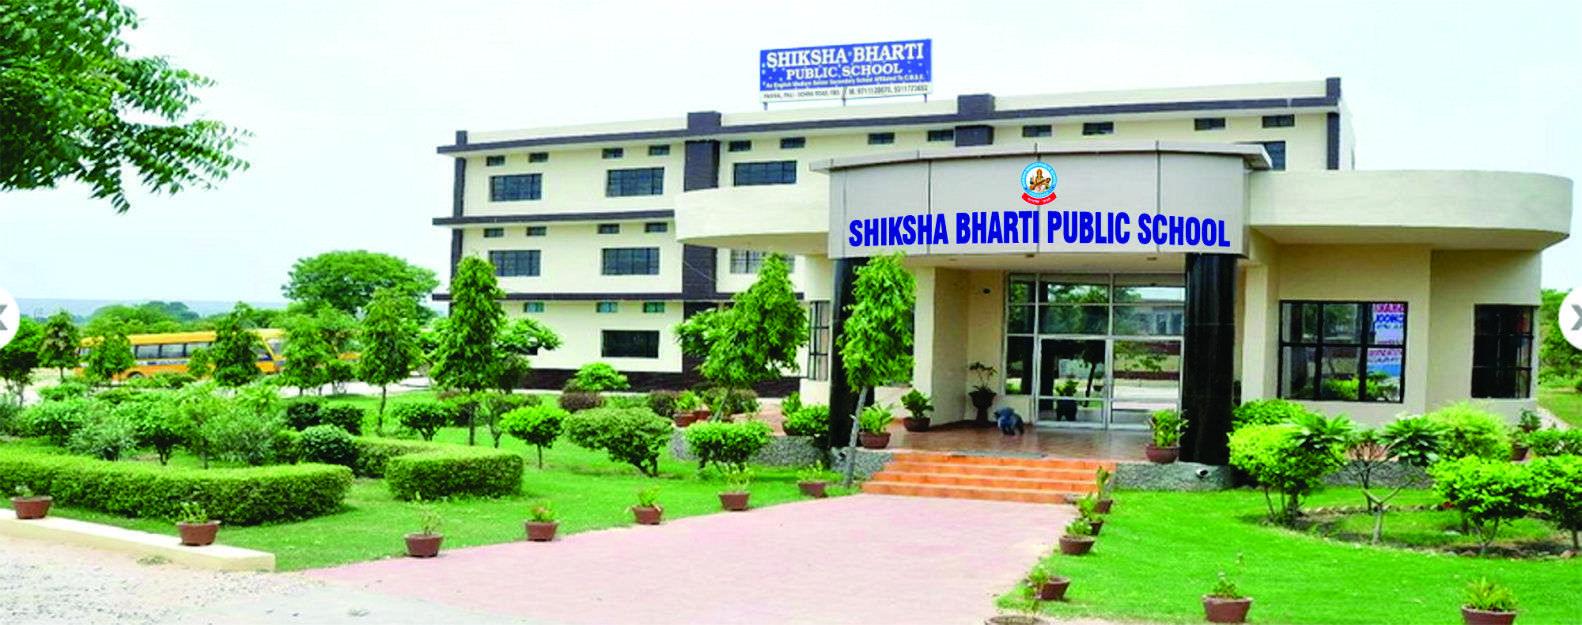 SHIKSHA BHARTI PUBLIC SCHOOL VILL PAKHAL SOHNA PALI ROAD FARIDABAD 2 1 116 NIT FARIDABAD HARYANA 530584